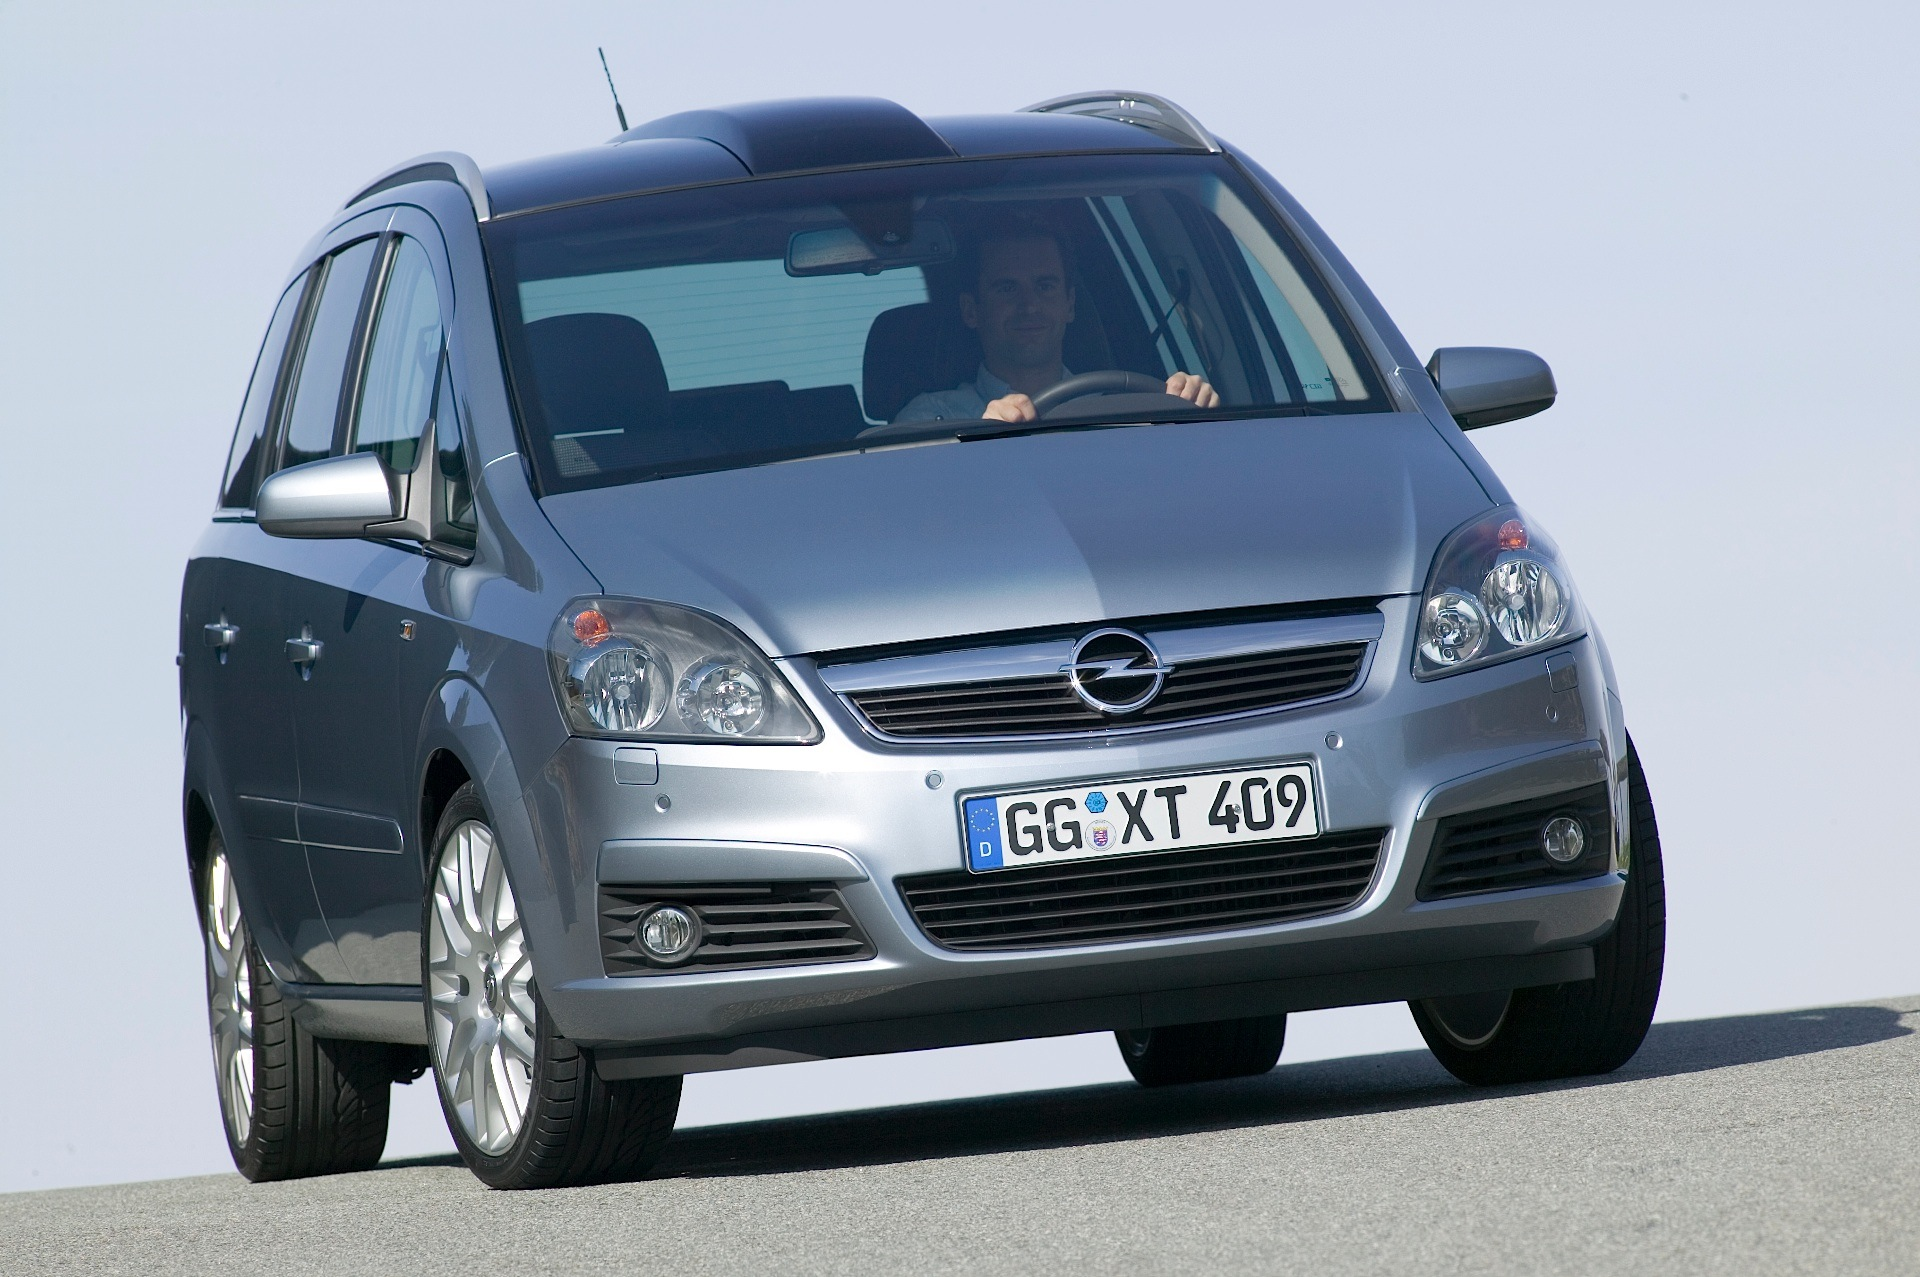 1998 2006 opel astra van truck review top speed -  Opel Zafira 2008 2014